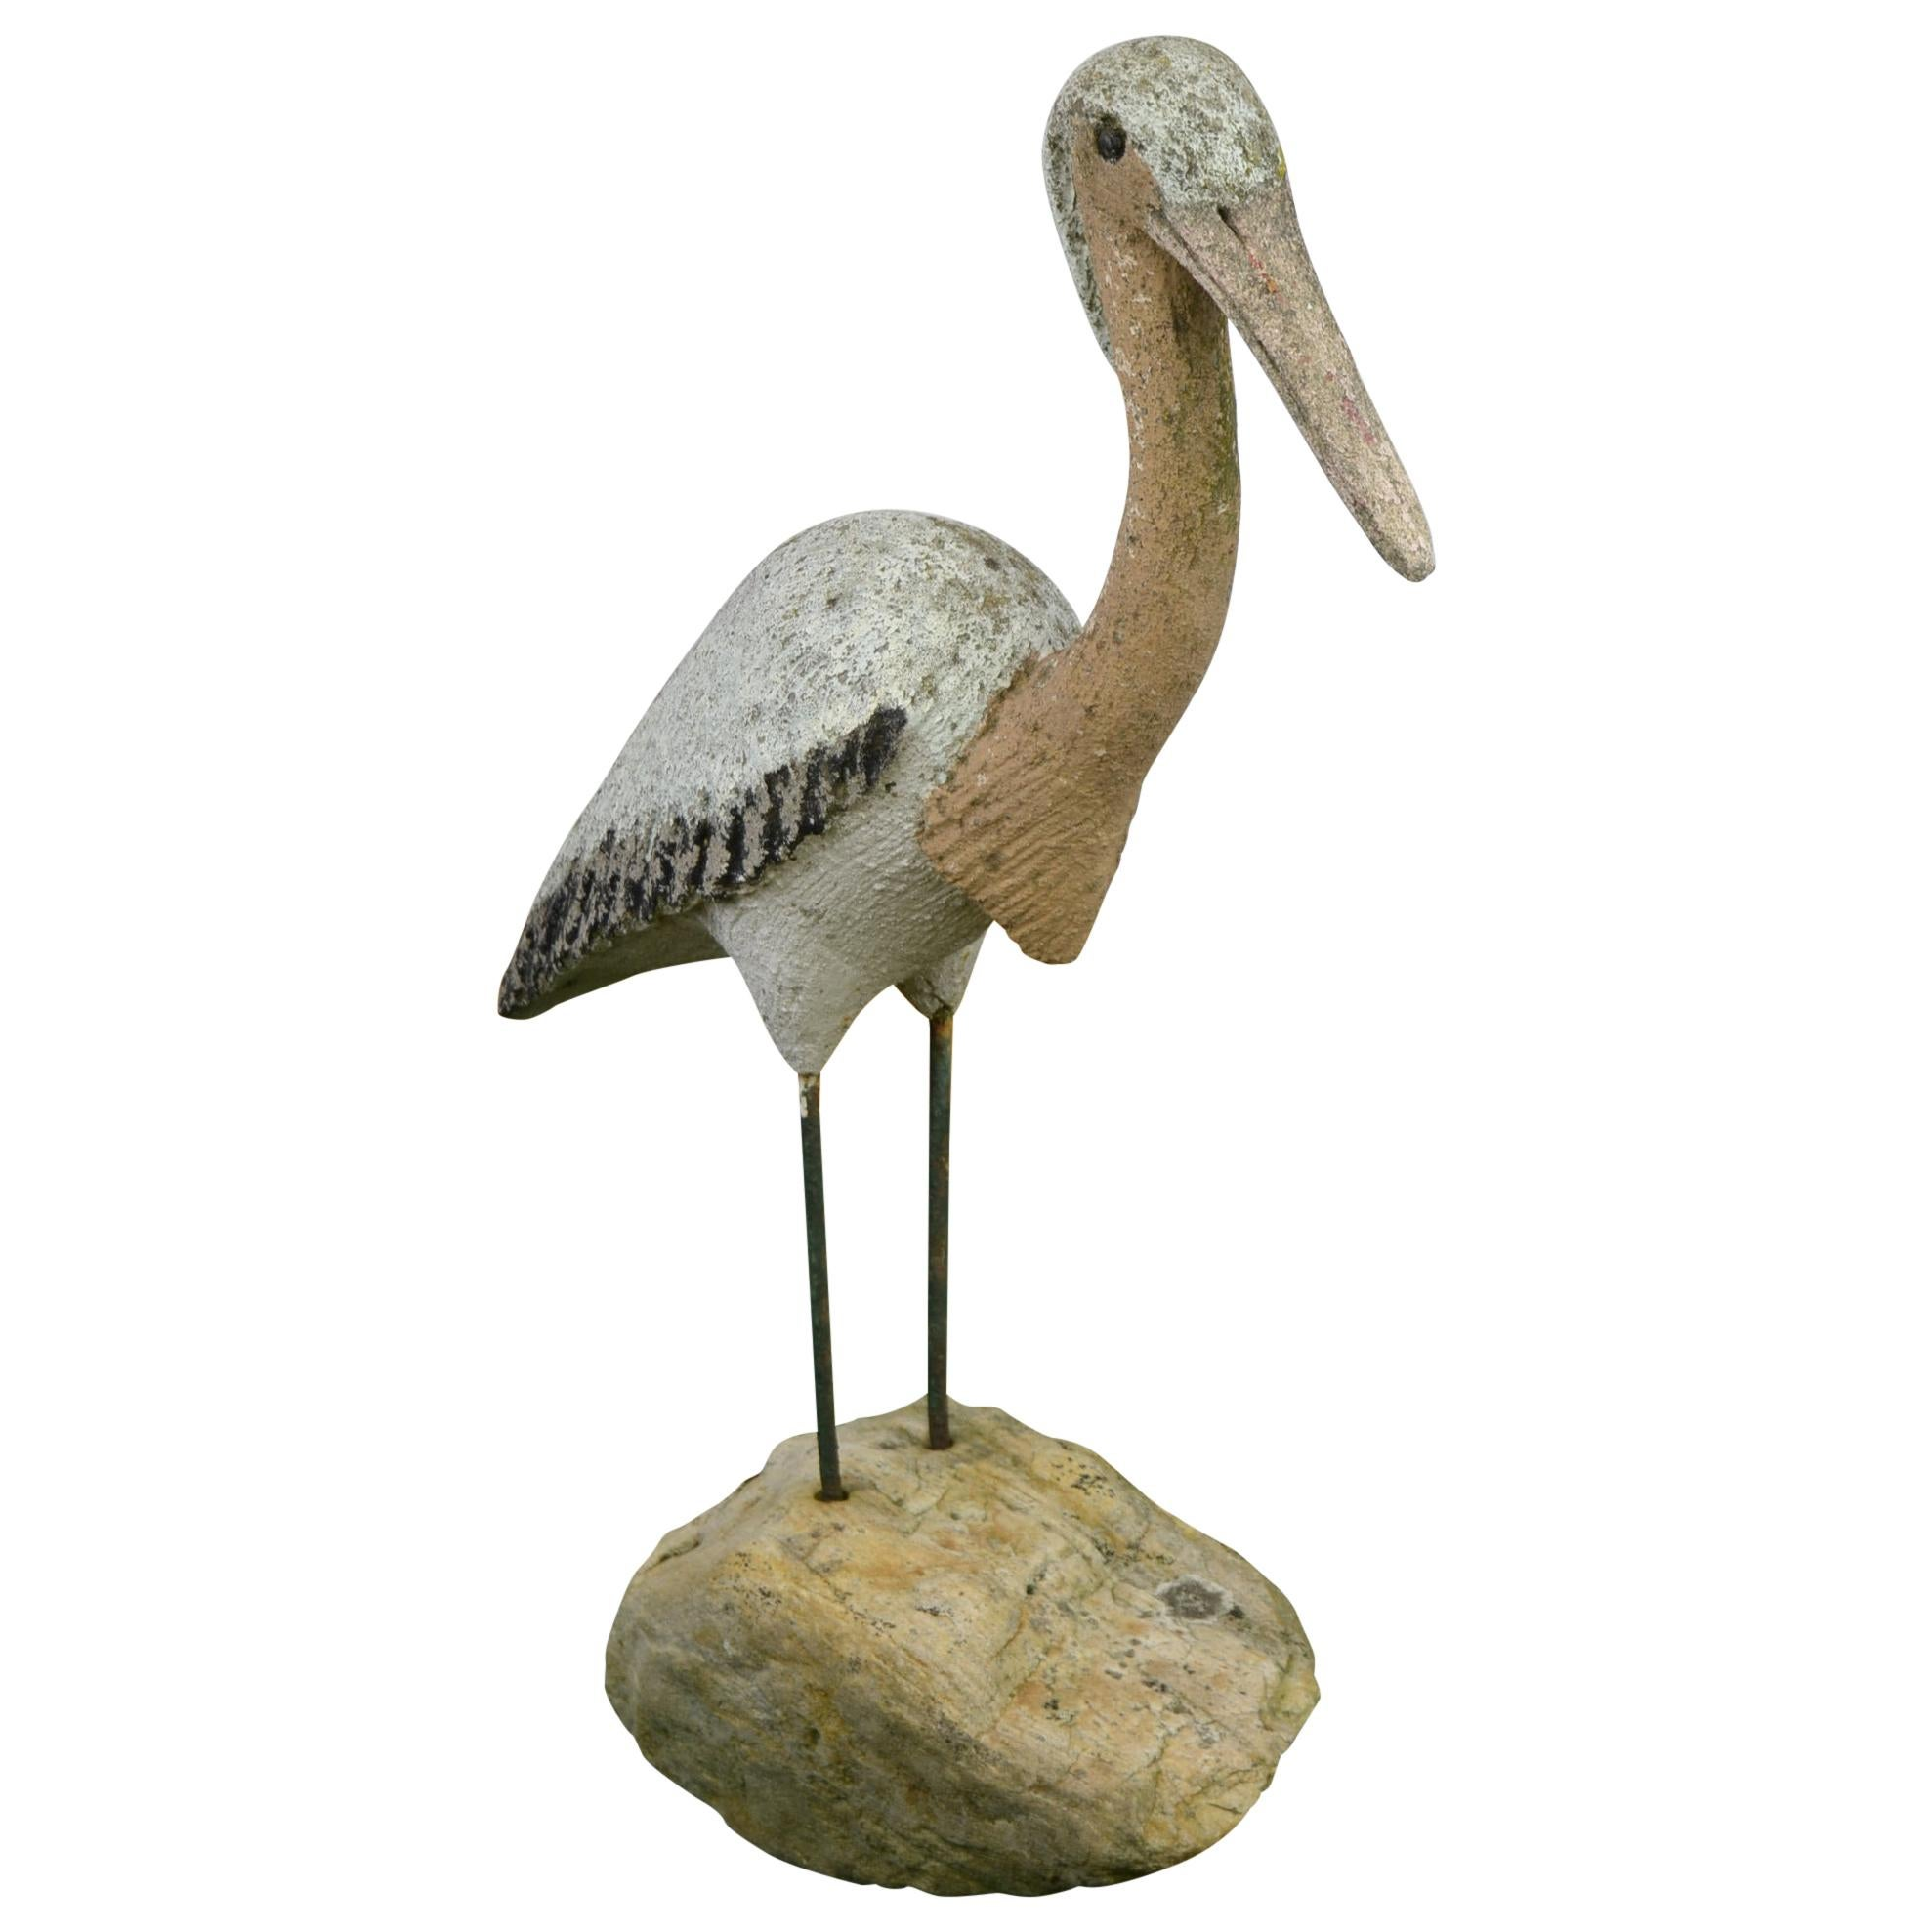 French Concrete Garden Bird Sculpture, 1950s